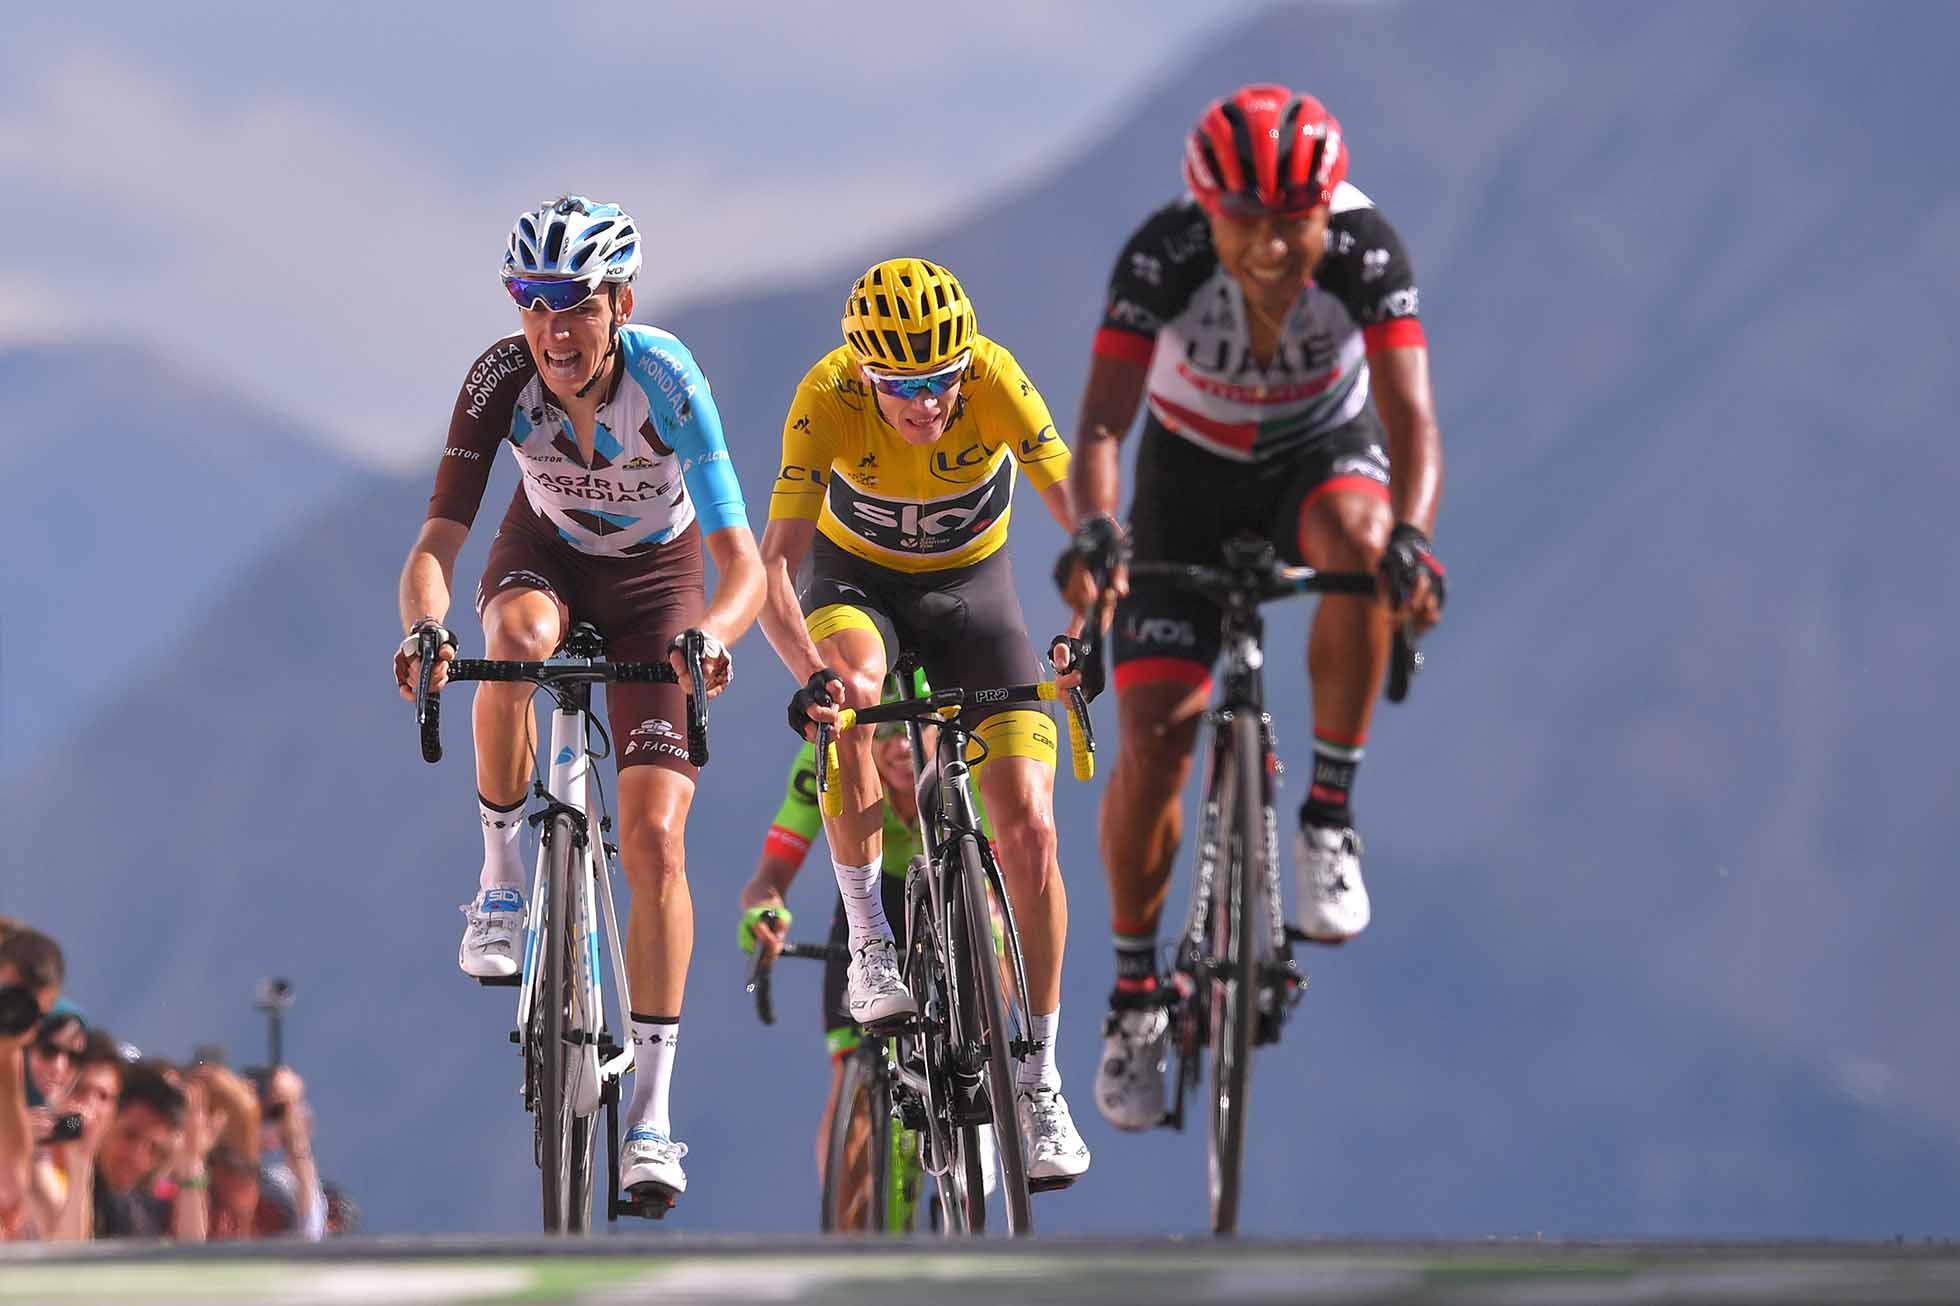 Cycling: 104th Tour de France 2017 / Stage 18 Arrival / Romain BARDET (FRA)/ Christopher FROOME (GBR) Yellow Leader Jersey / John Darwin ATAPUMA (COL)/ Briancon - Izoard-Col d'Izoard 2360m (179,5km)/ TDF / (Photo by Tim de Waele/Corbis via Getty Images)